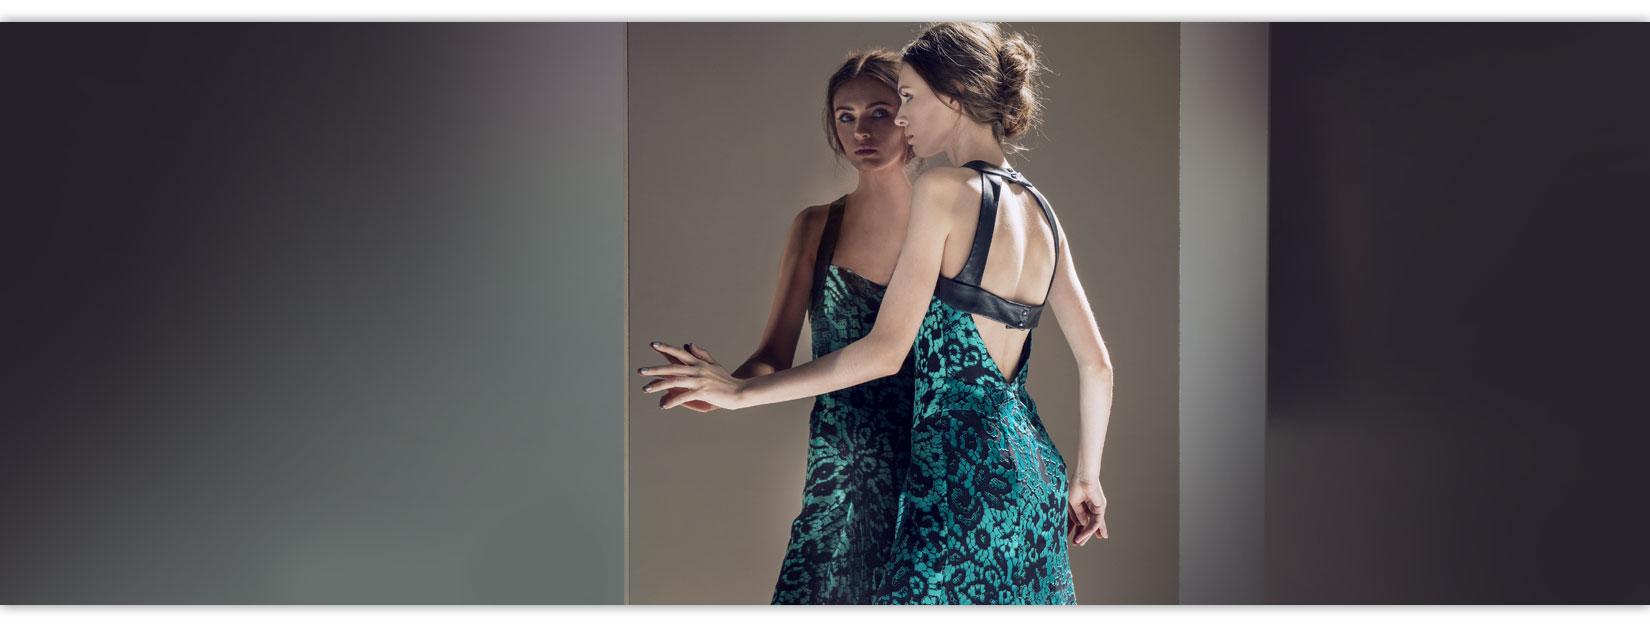 Nanette Lepore | Women's Apparel, Designer Shoes, Handbags, Swim